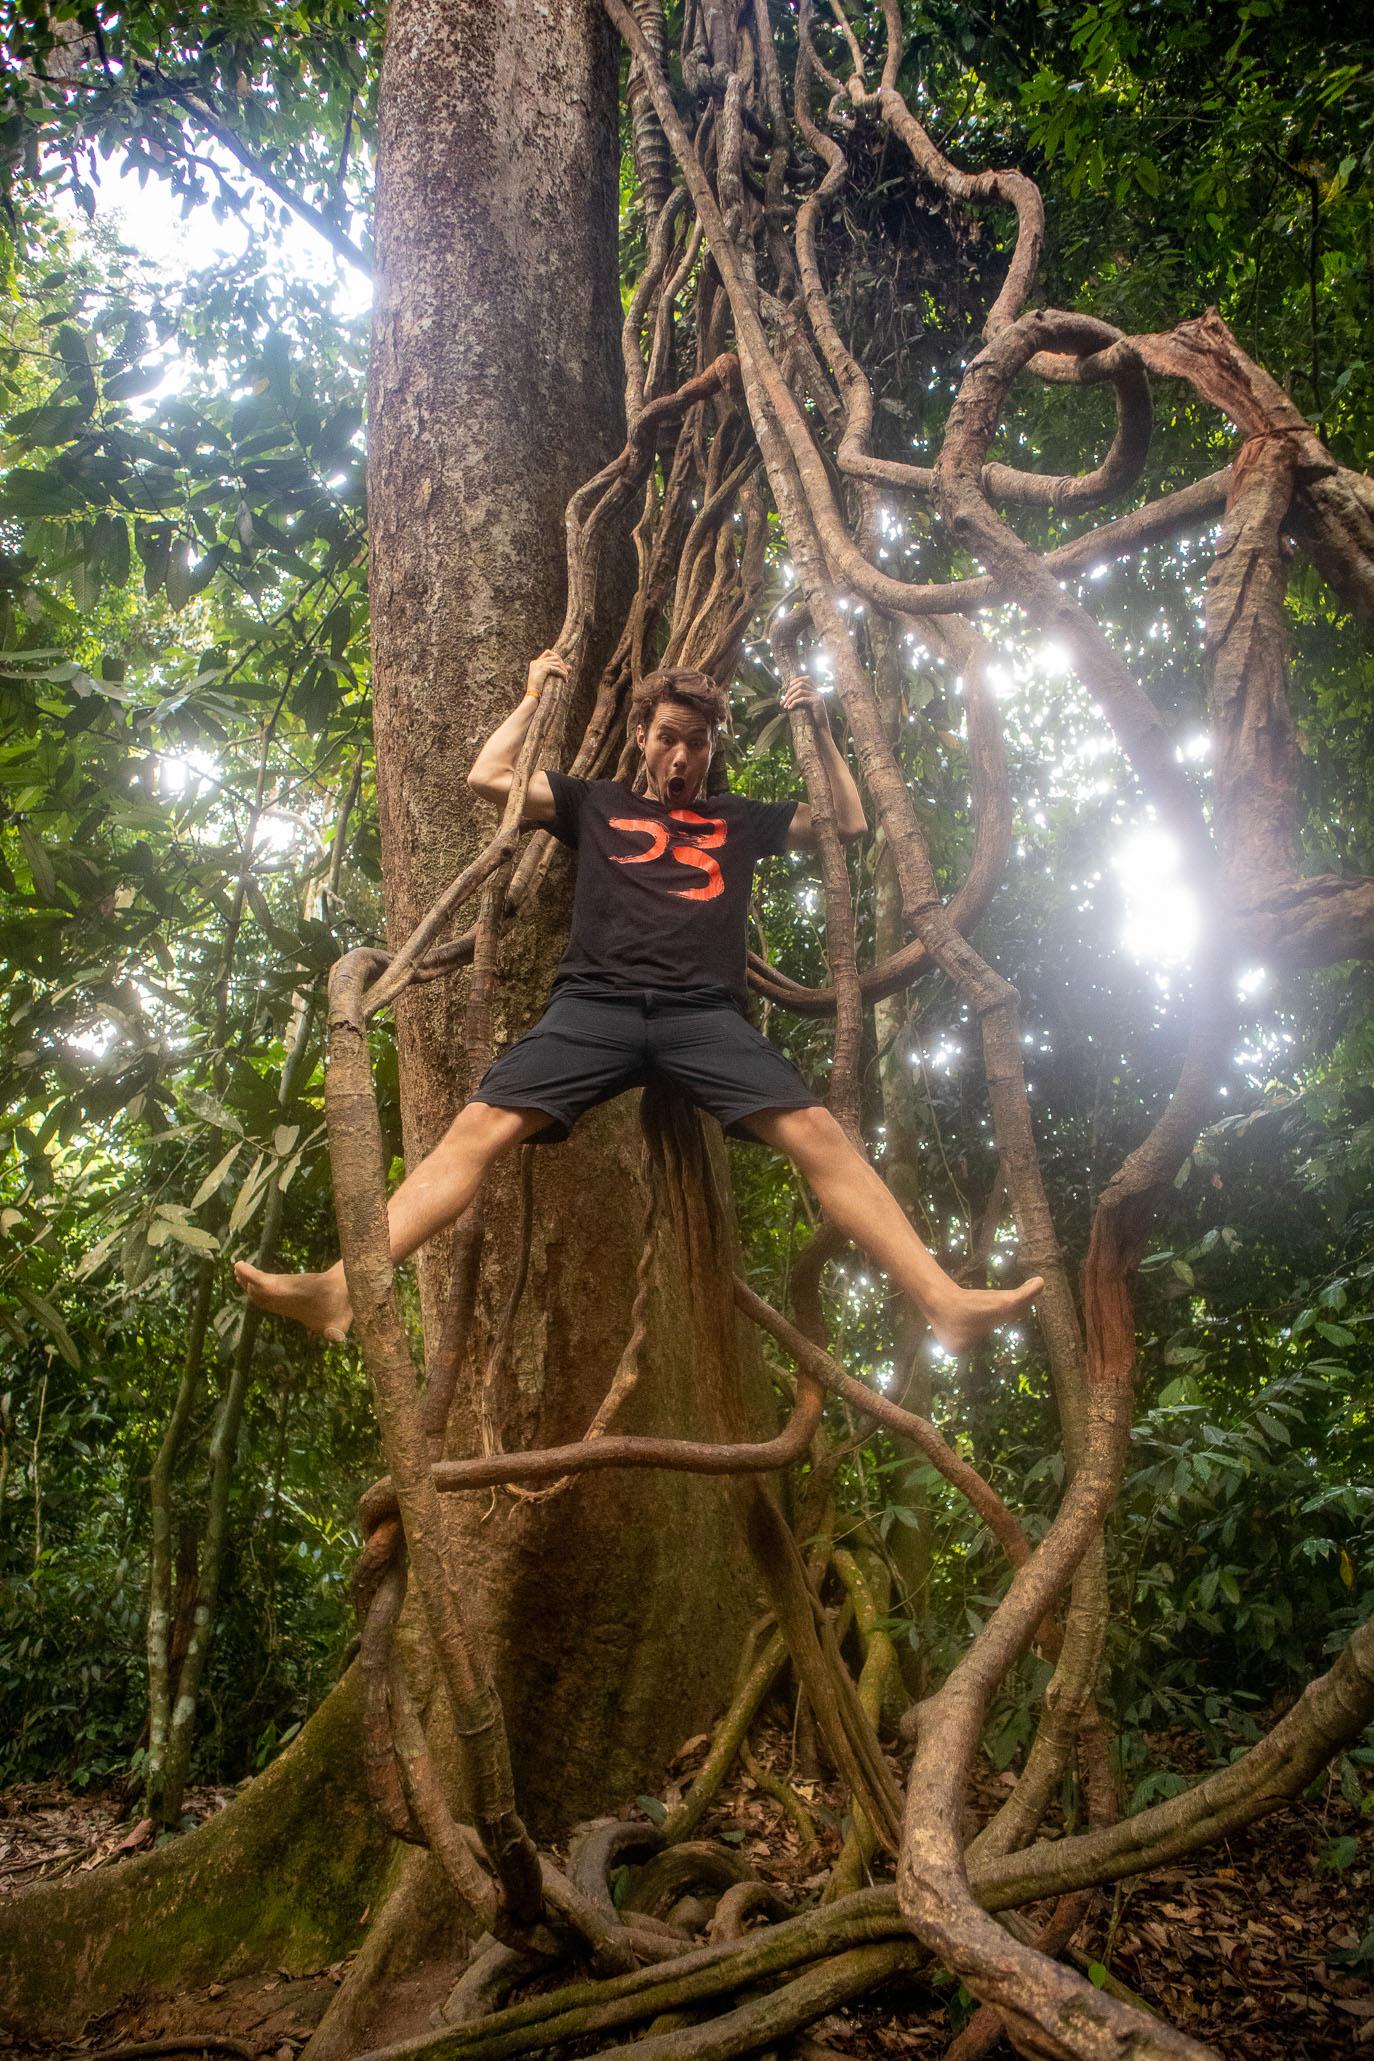 https://bubo.sk/uploads/galleries/7396/tomashornak_indonezia_sumatra_img_0120-1-8.jpg